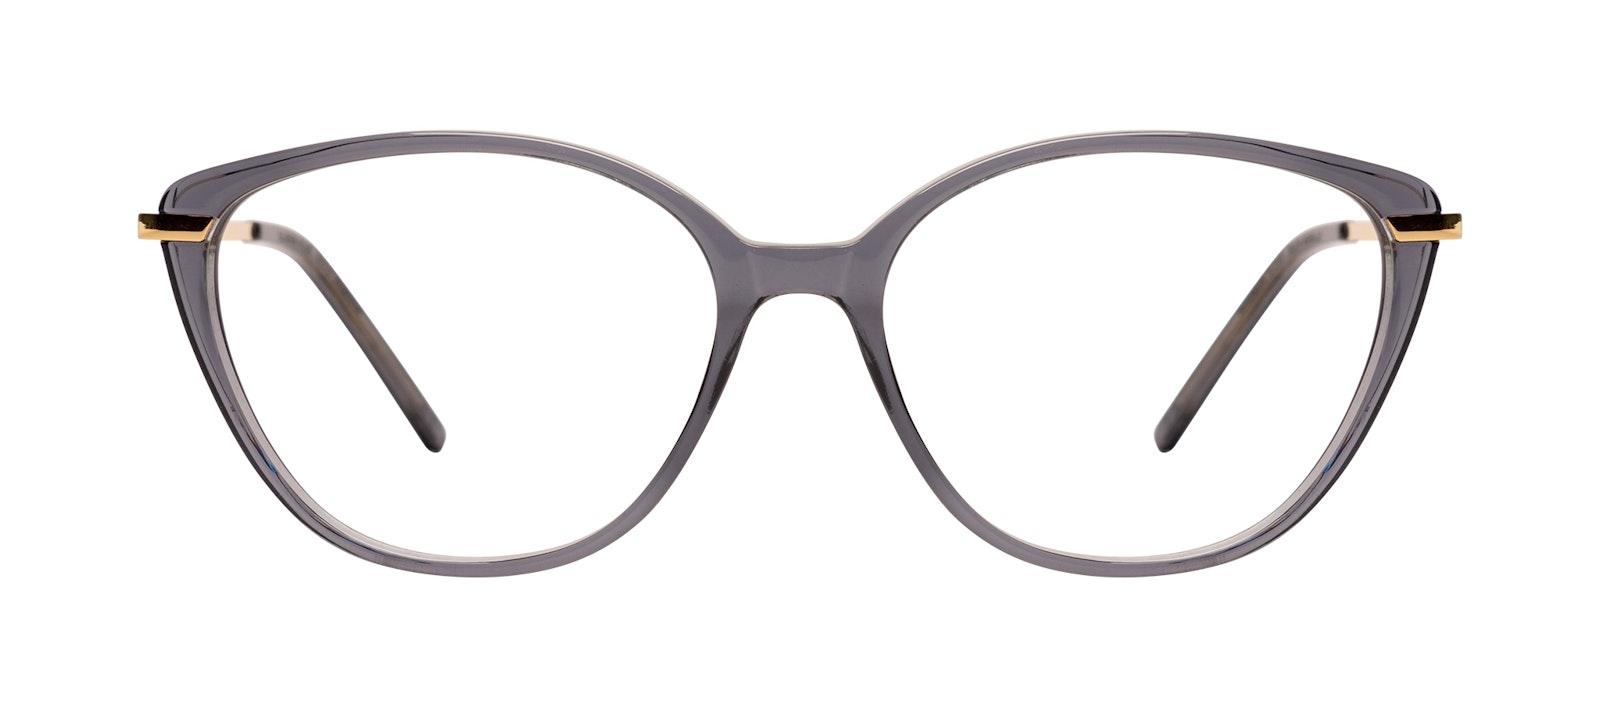 Affordable Fashion Glasses Cat Eye Eyeglasses Women Illusion Plus Gold Shadow Front